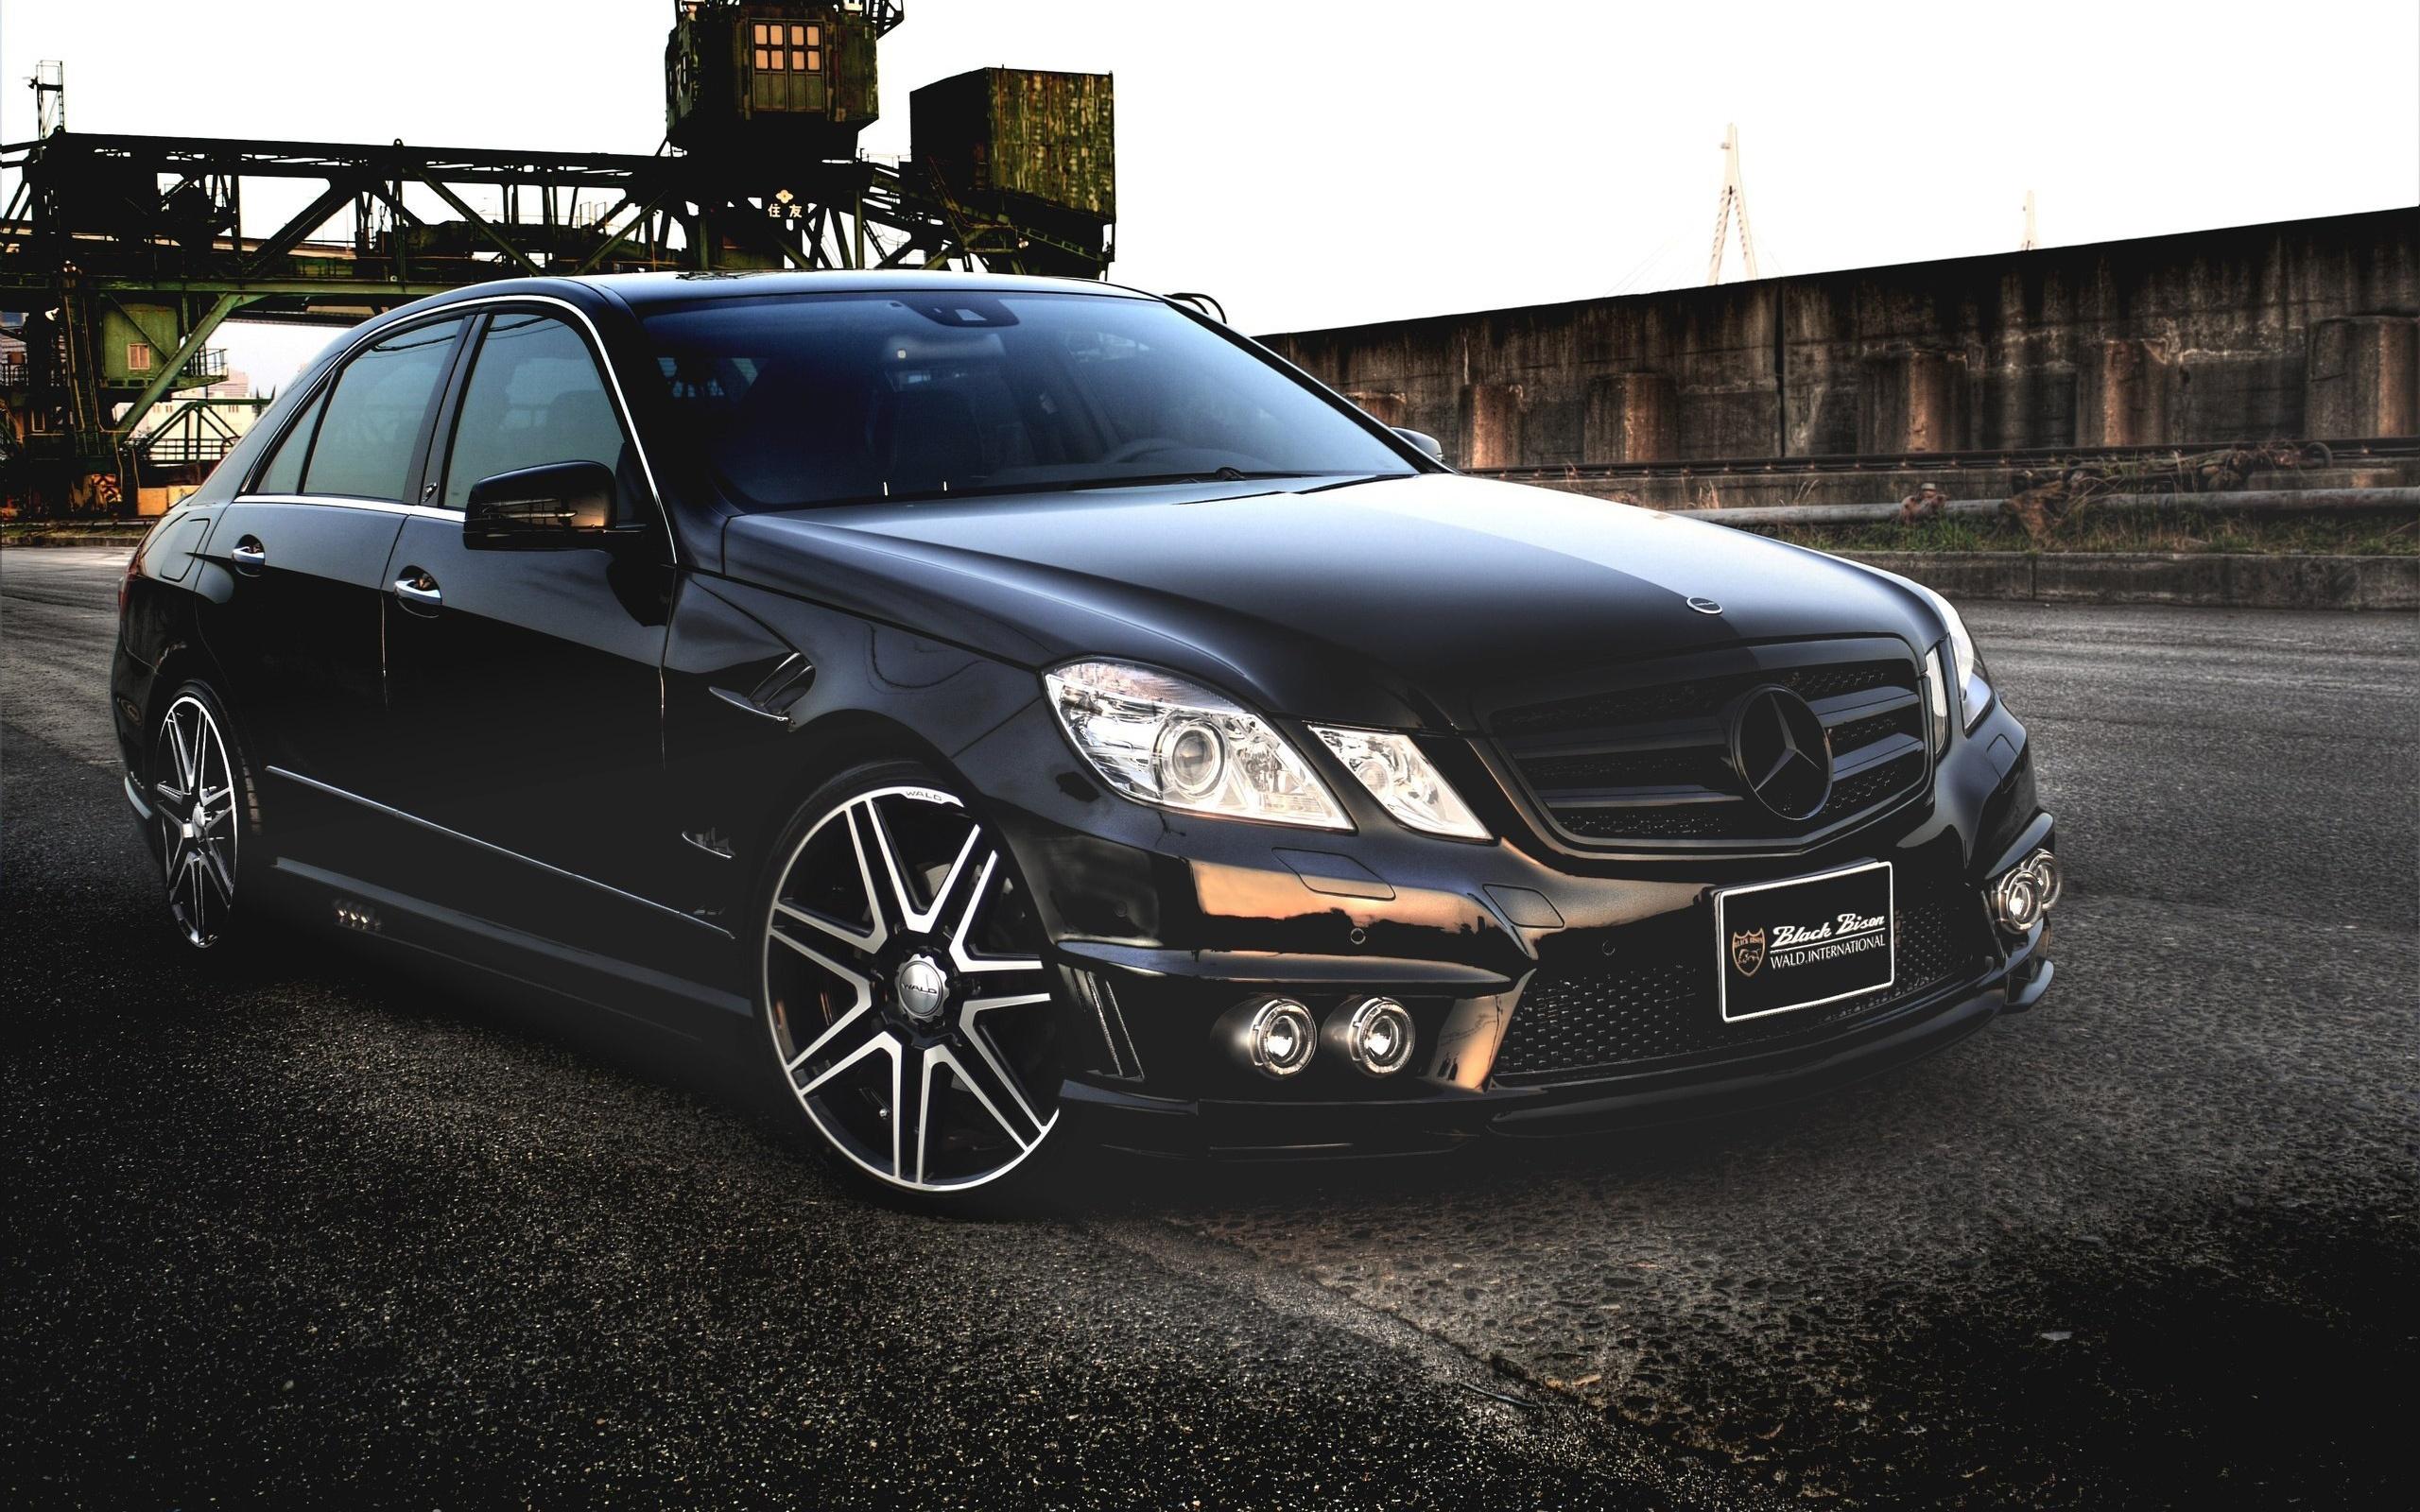 Download wallpaper 2560x1600 mercedes benz e class black for Mercedes benz e class black